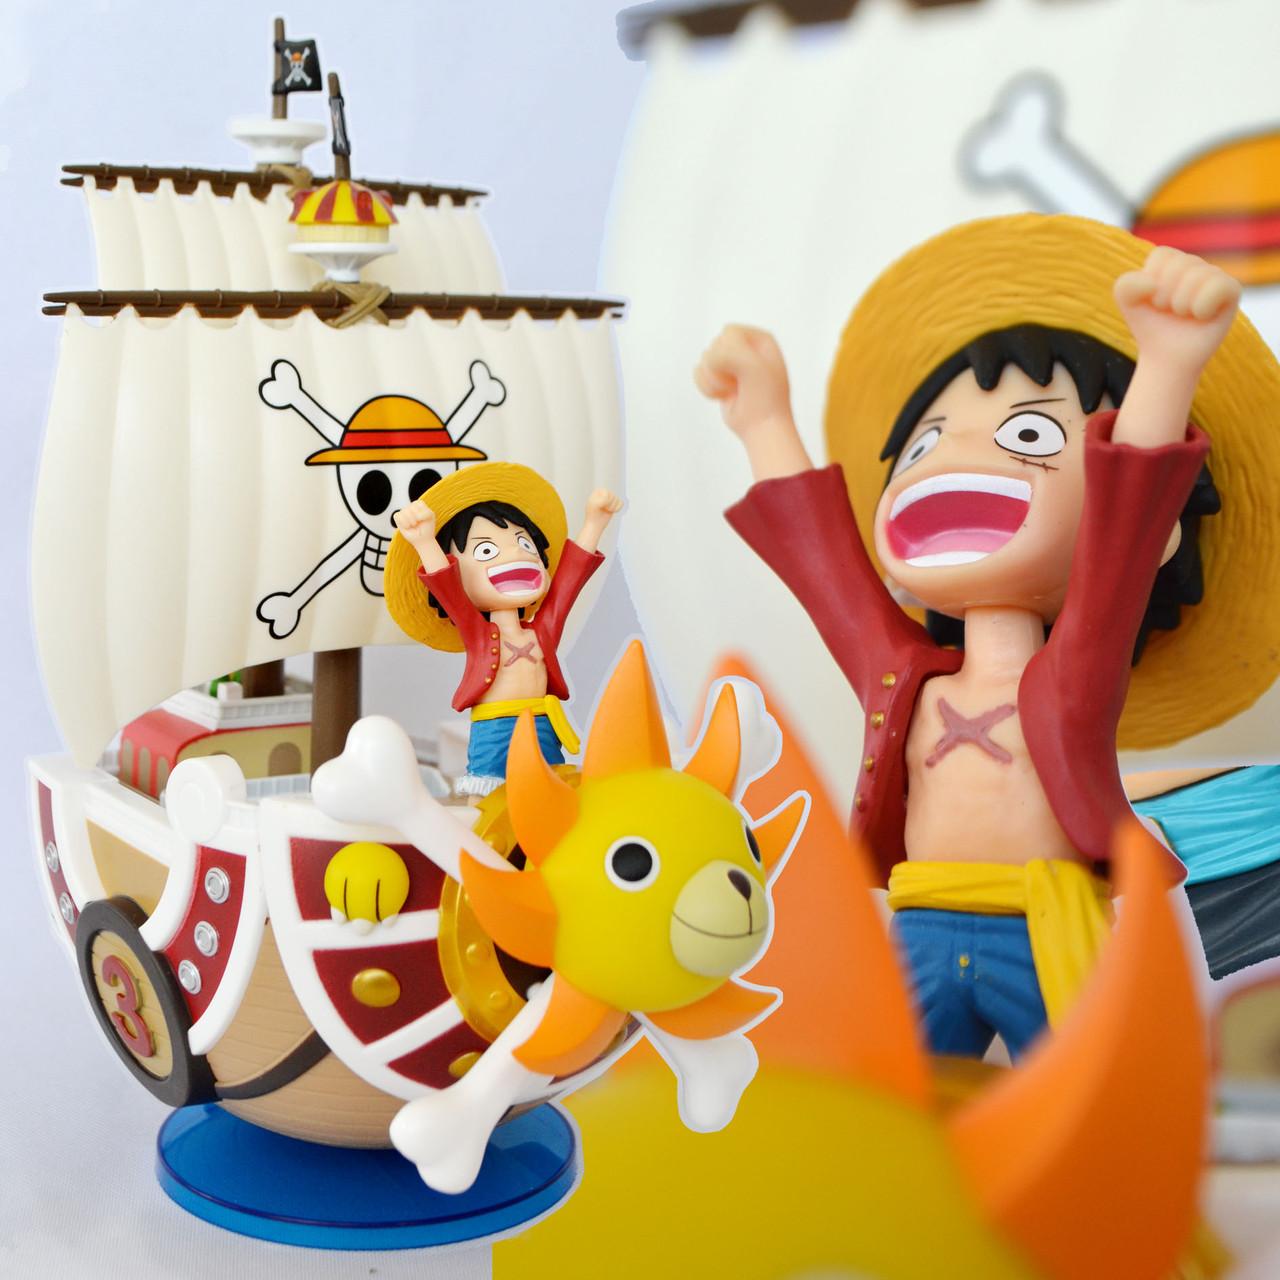 Фигурка One Piece - Monkey D. Luffy & Thousand Sunny - Mega World Collectable Figure Special!!